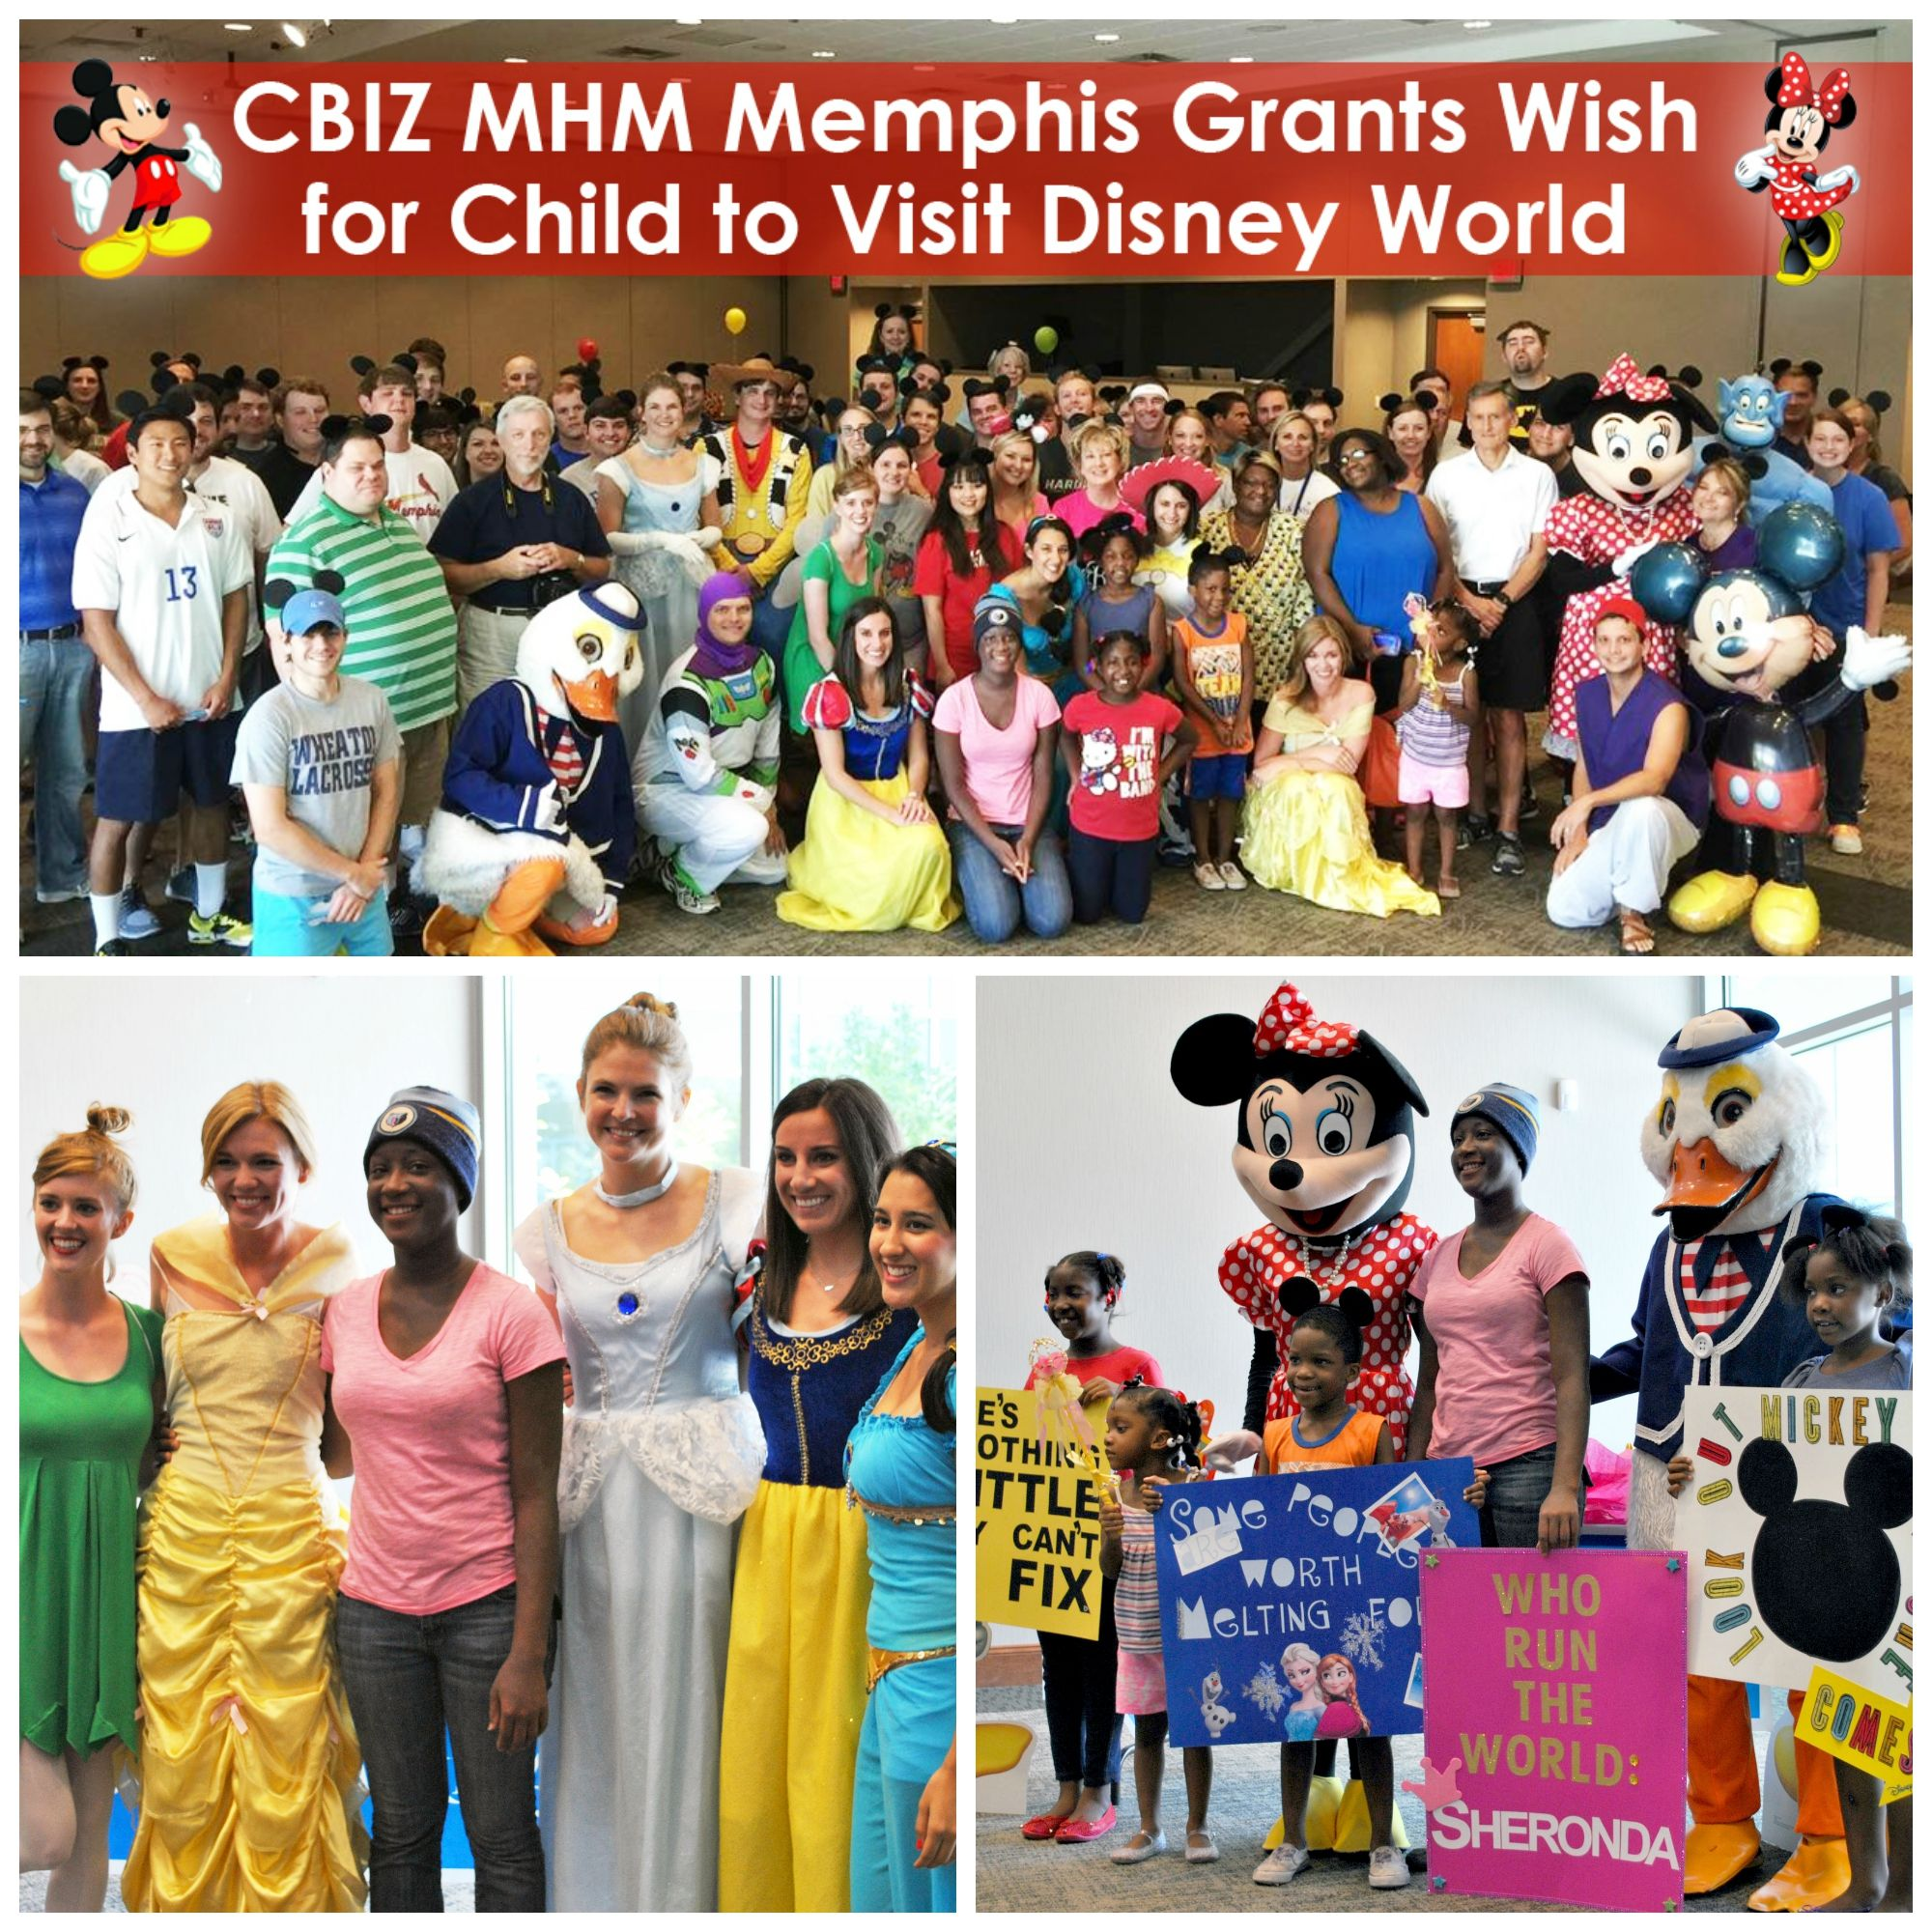 Make A Wish Memphis